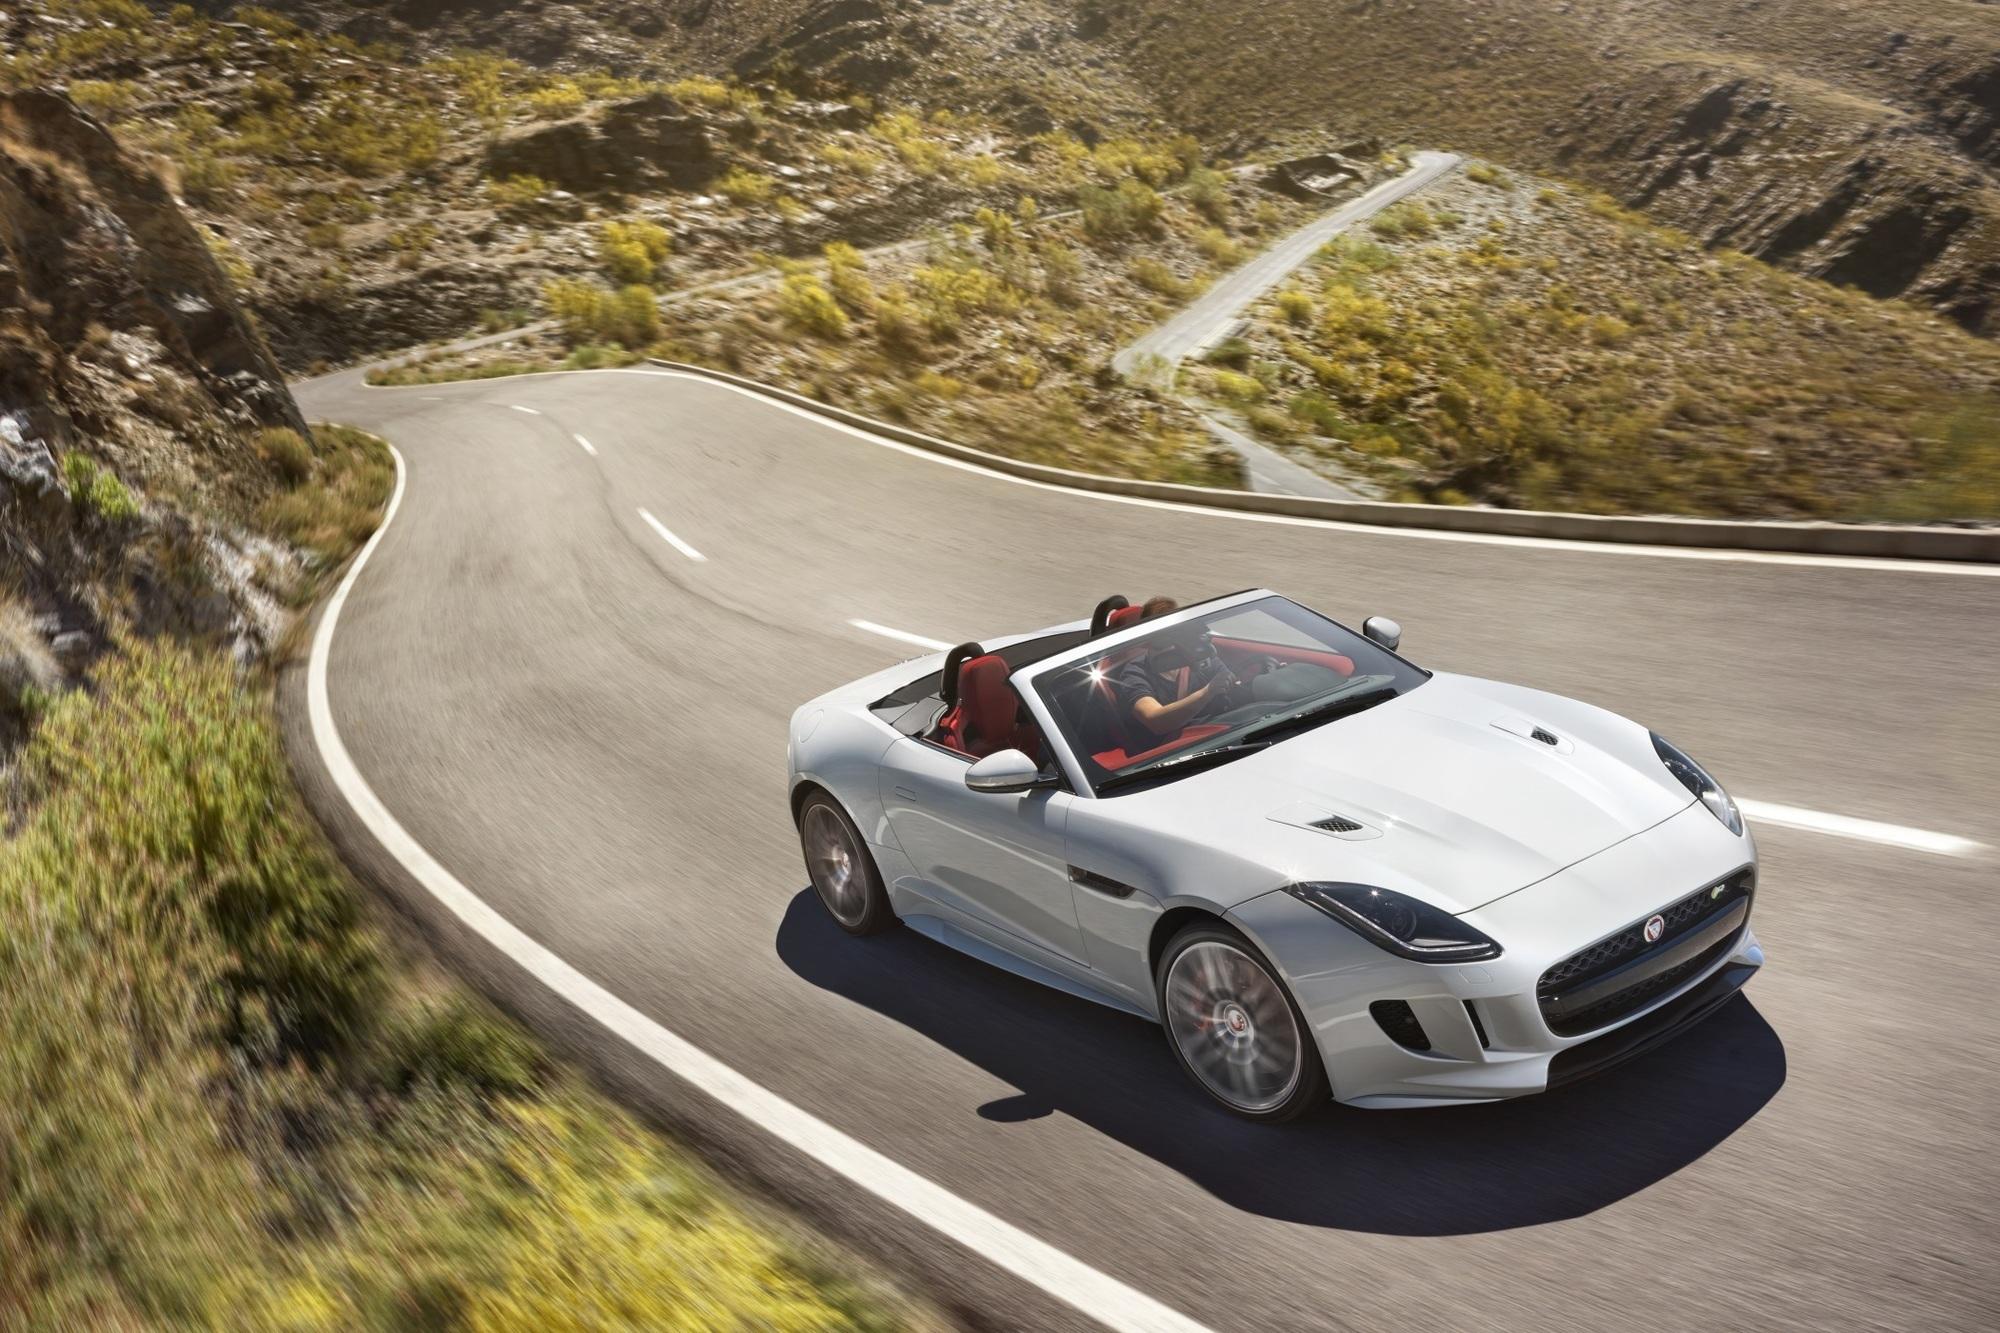 Fahrbericht: Jaguar F-Type AWD - Grip, Grip, Hurra